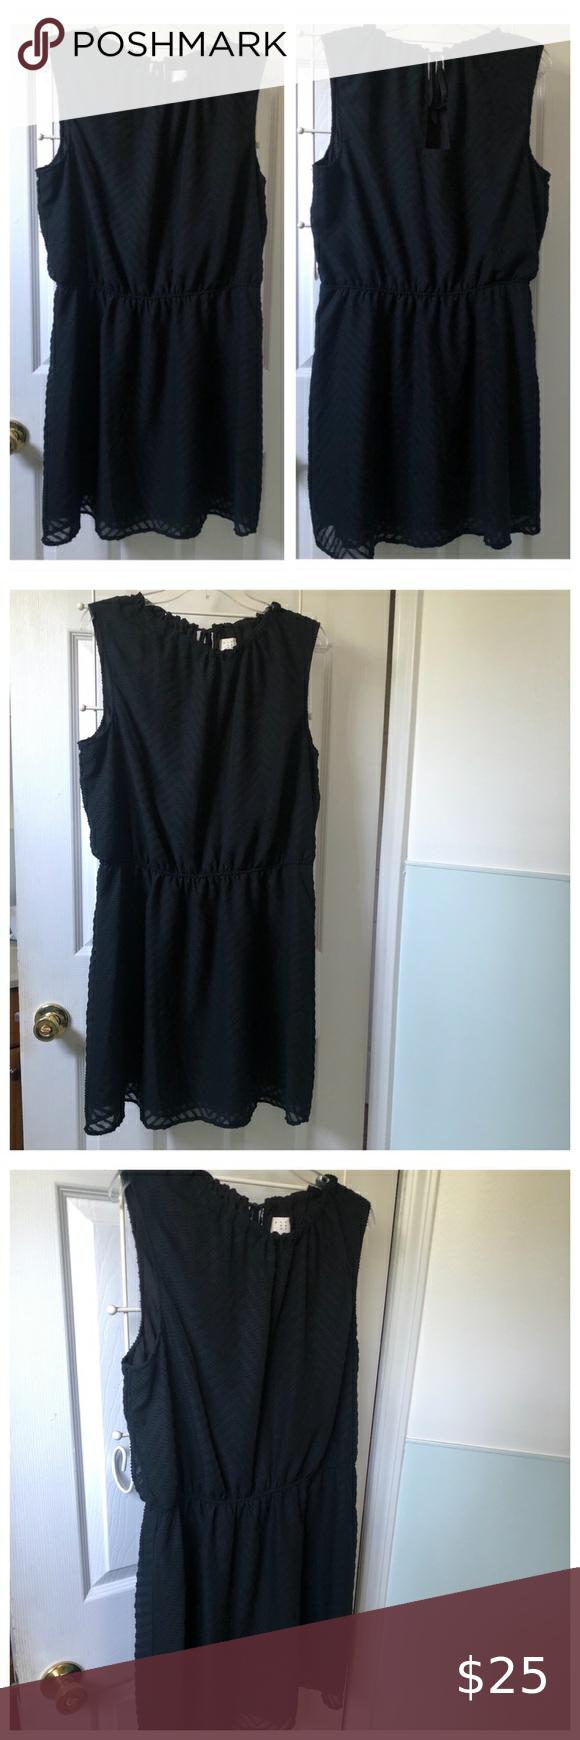 A New Day Sleeveless Black Dress Xl Black Sleeveless Dress Black Dress A New Day [ 1740 x 580 Pixel ]